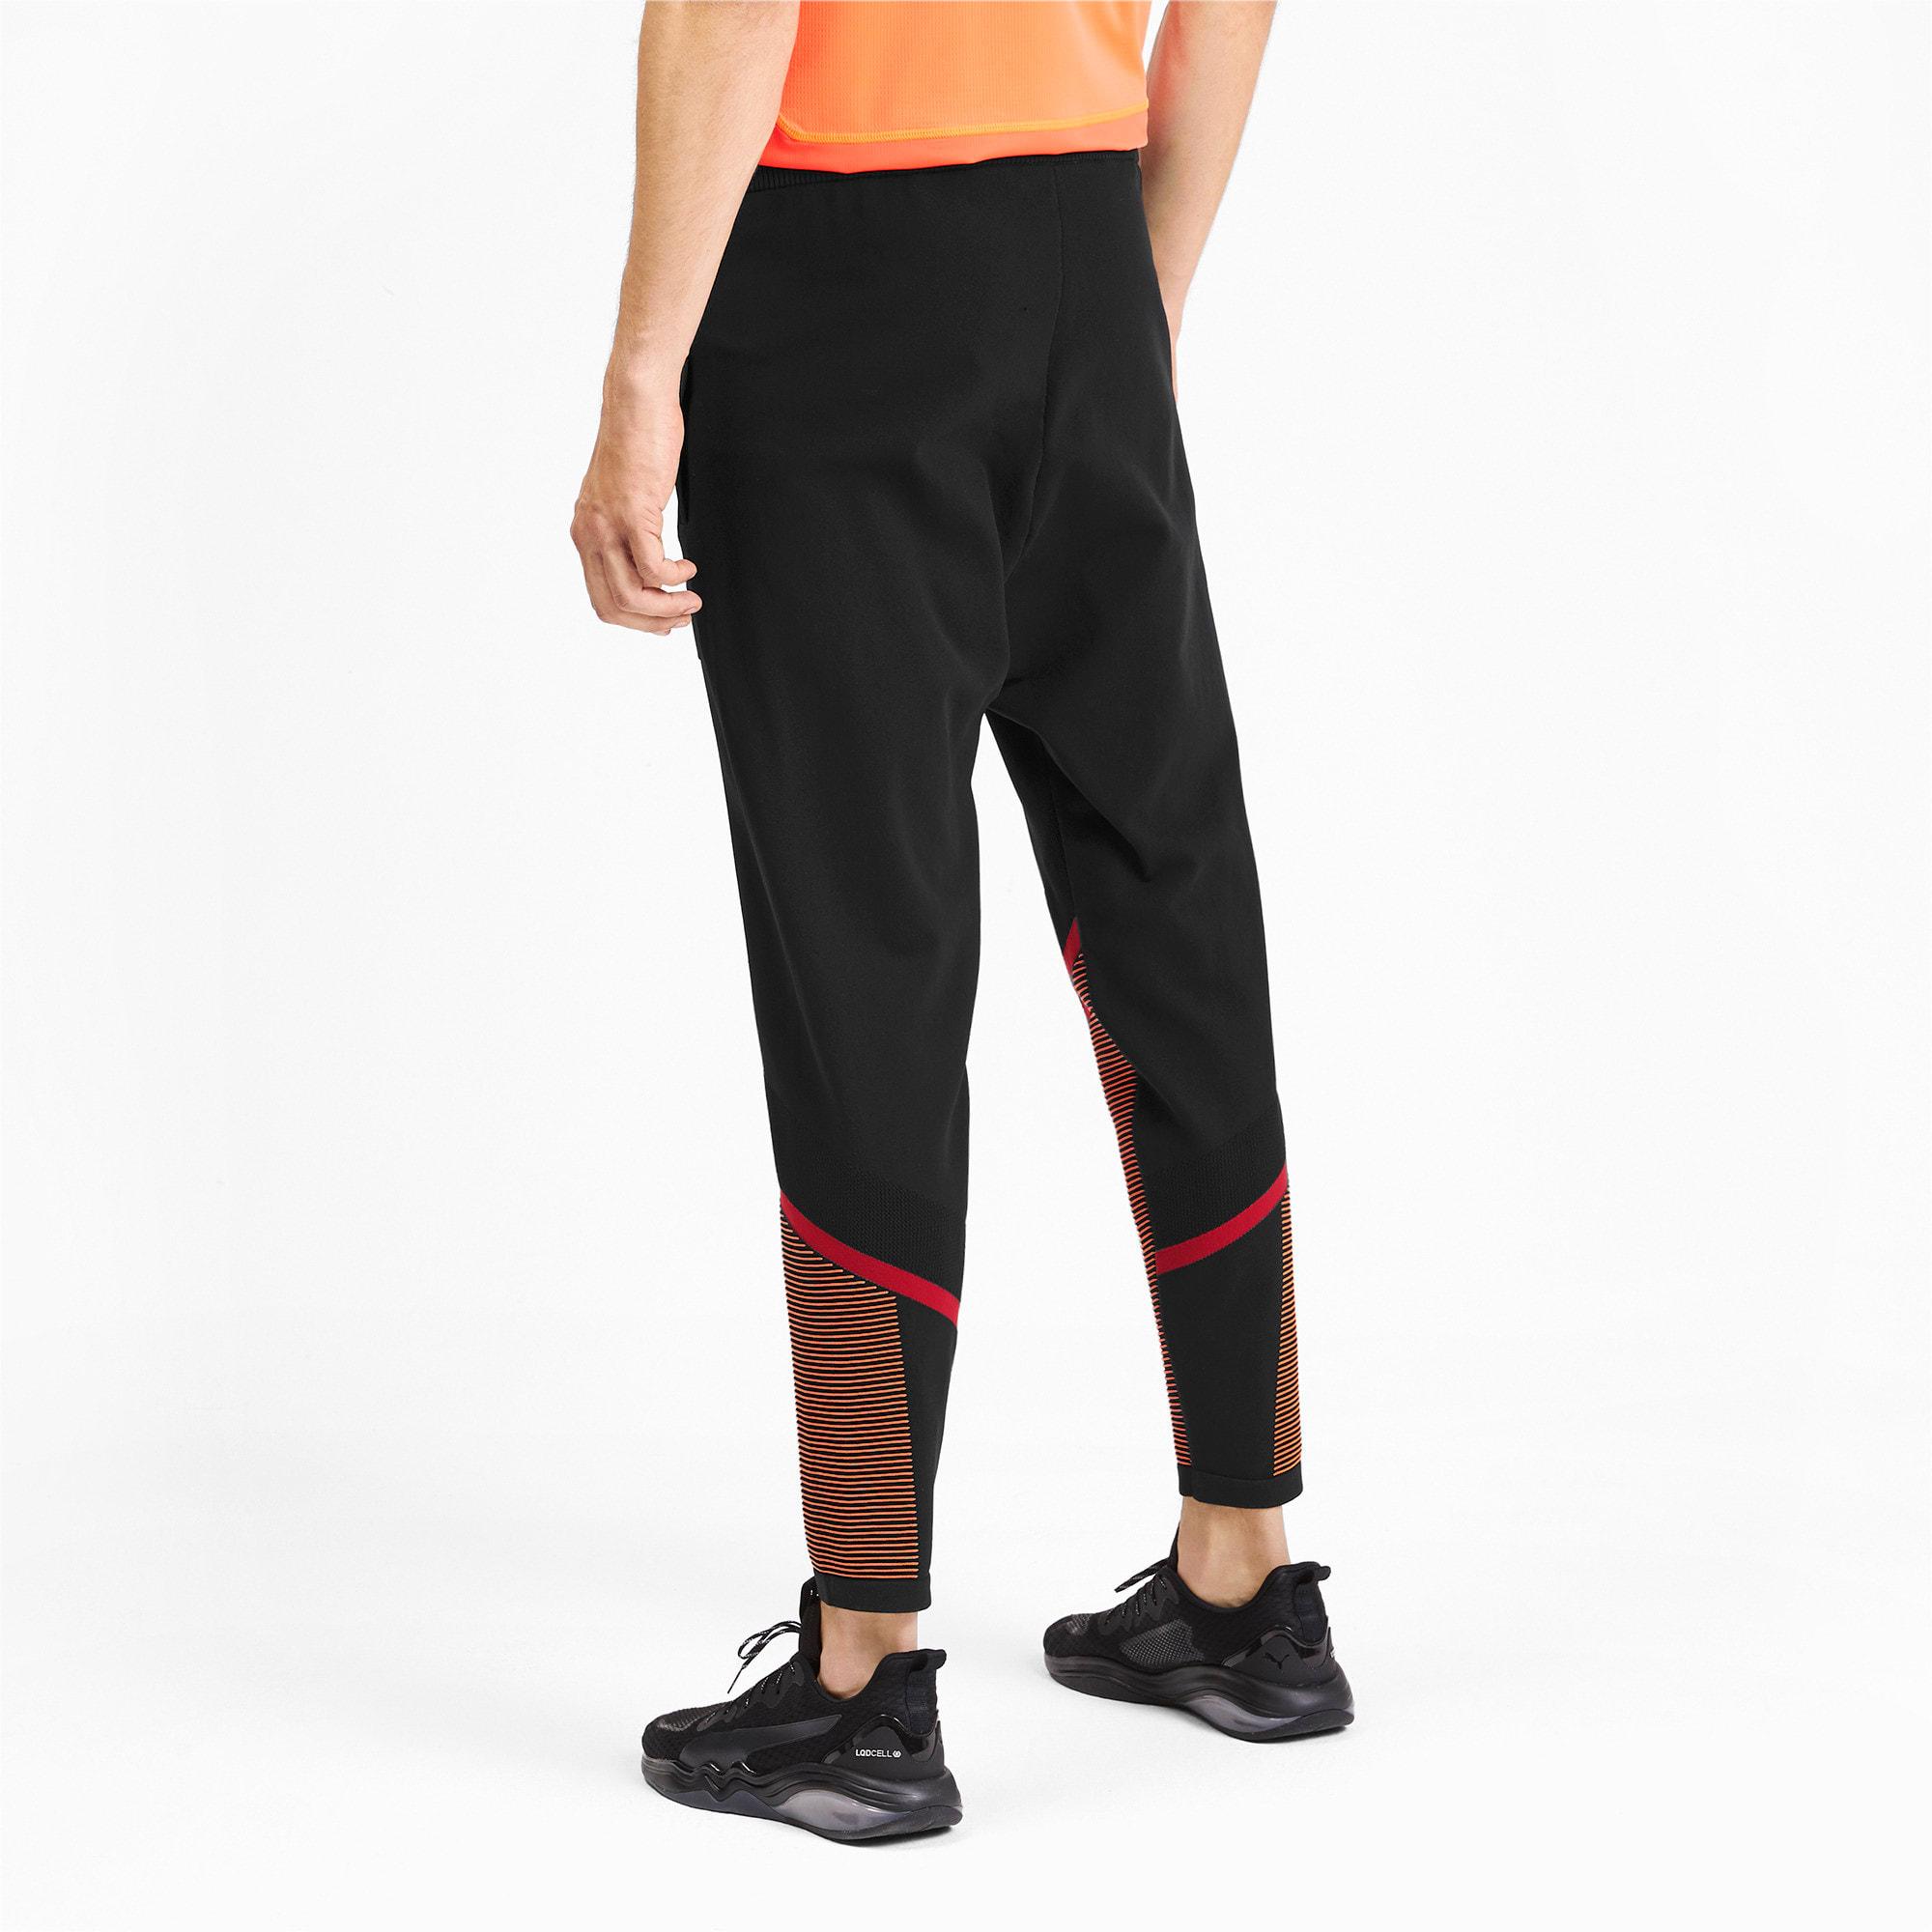 Miniatura 2 de Pantalones Reactive evoKNIT para hombre, Puma Black-Rhubarb, mediano